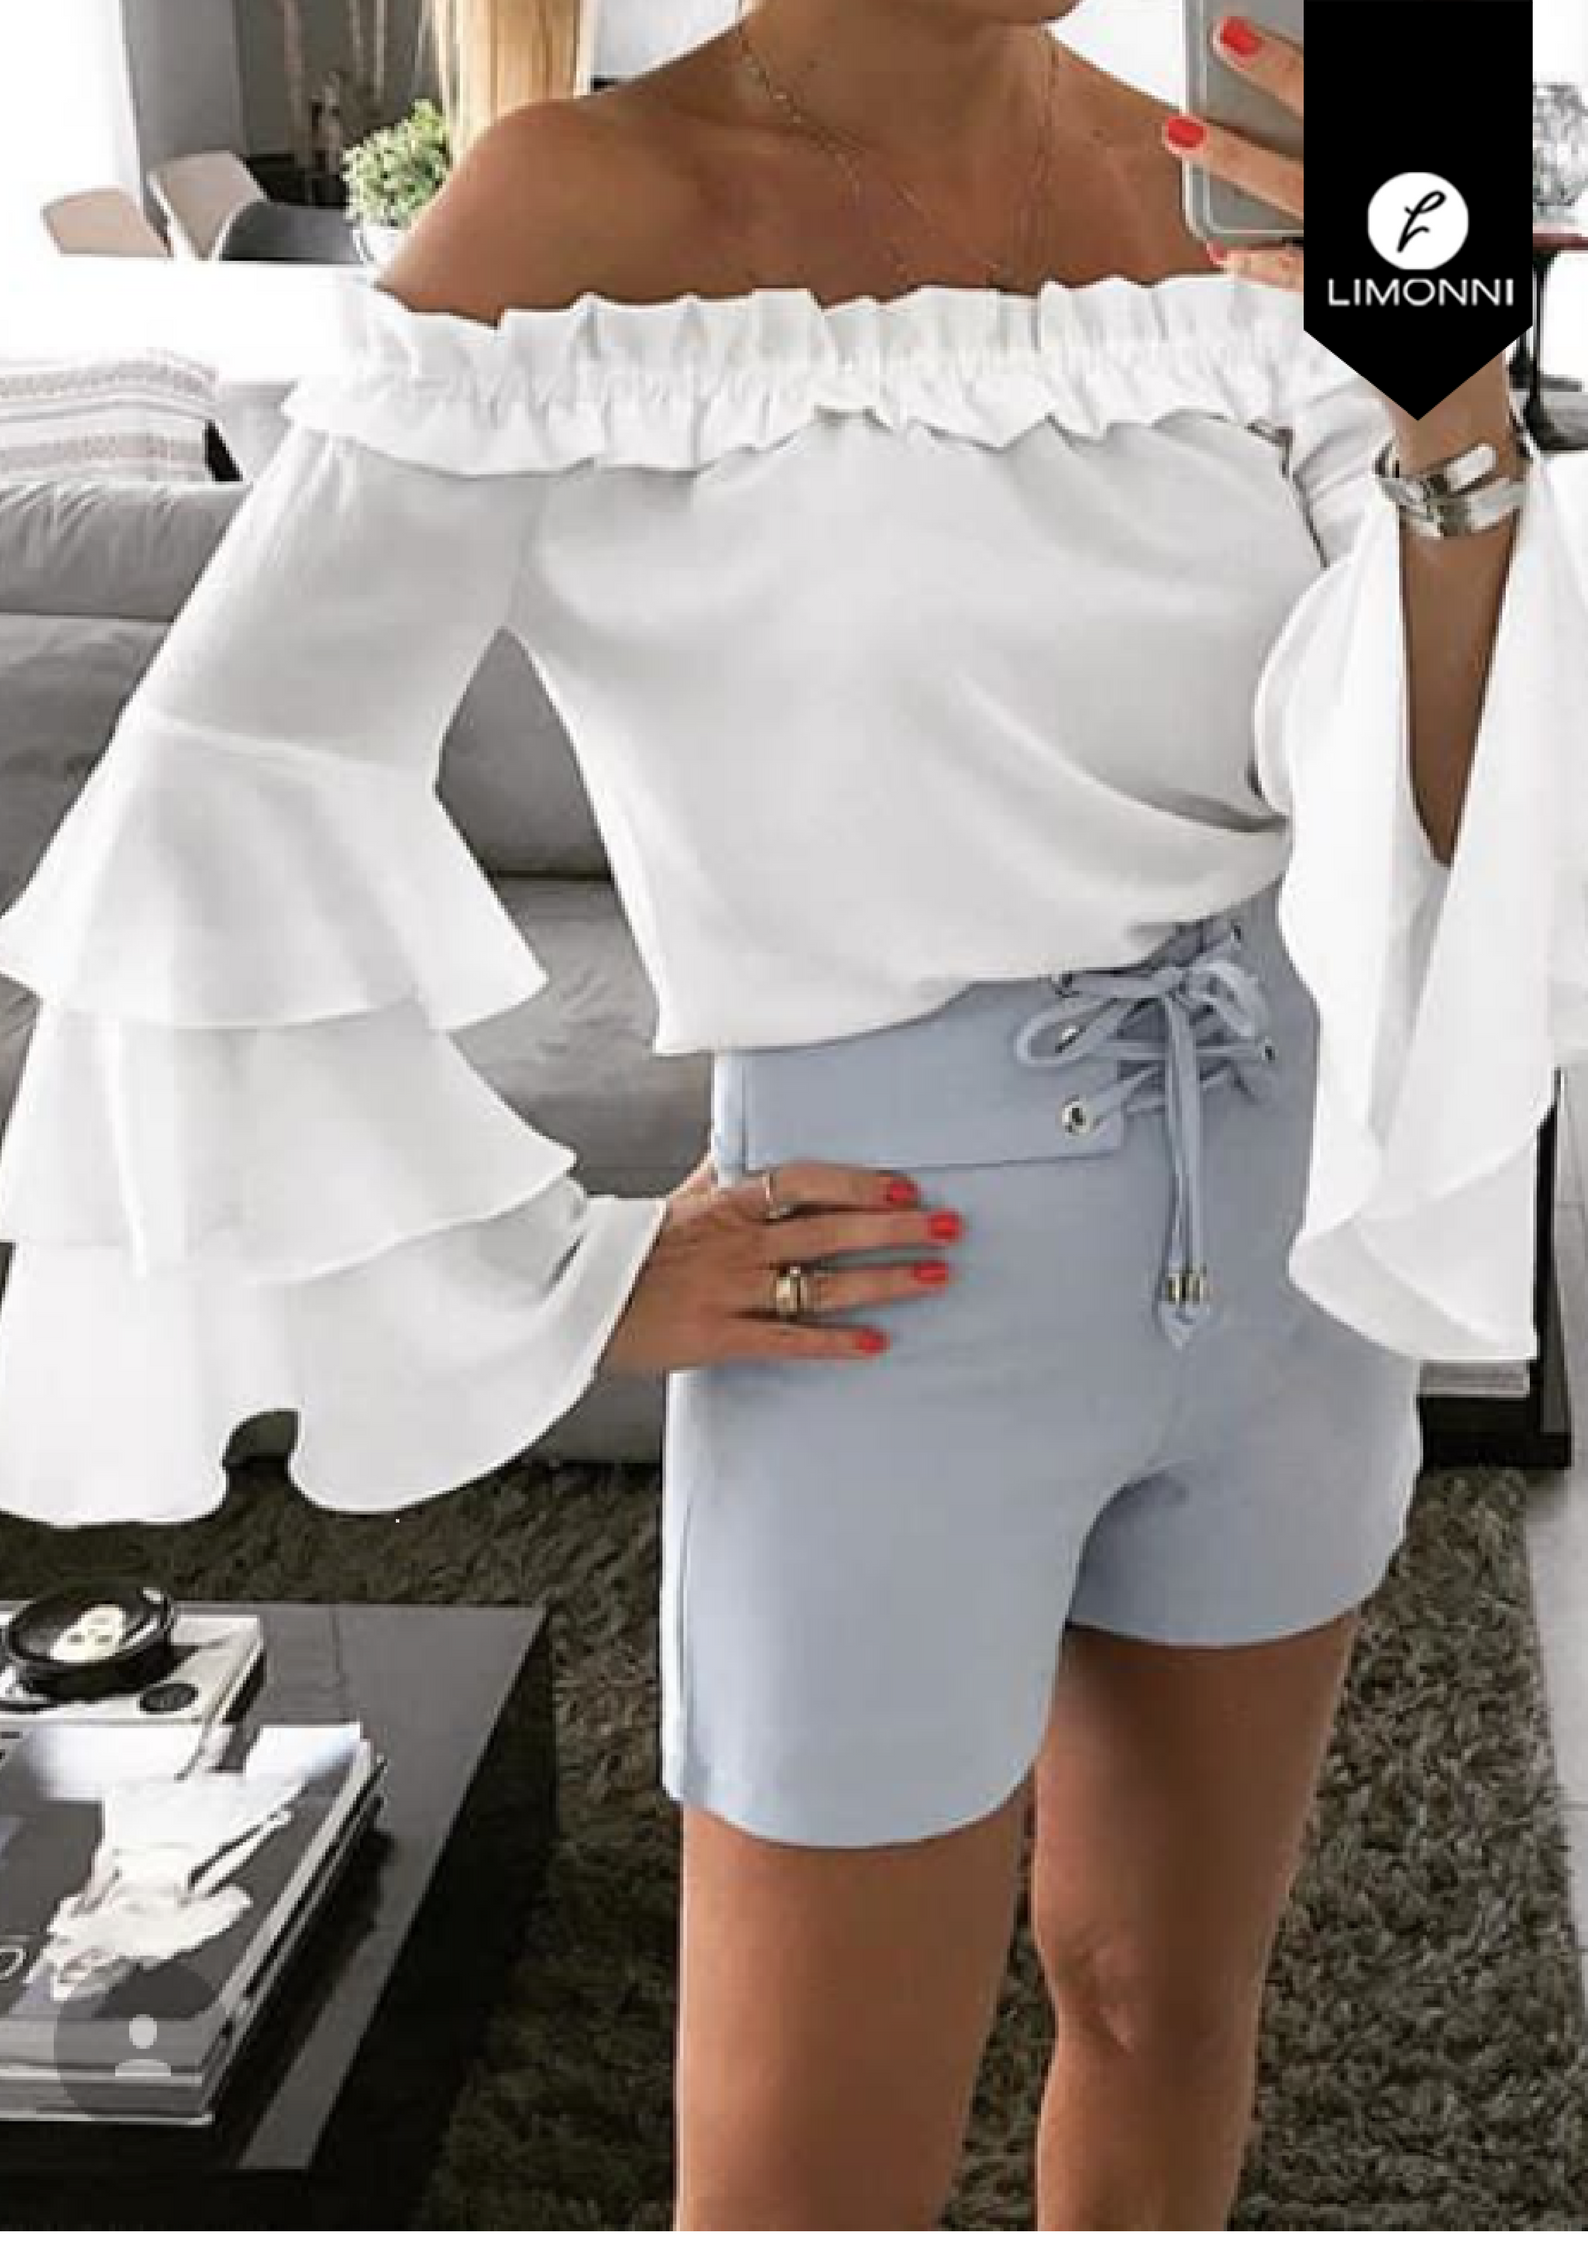 Blusas para mujer Limonni Bennett LI1396 Campesinas